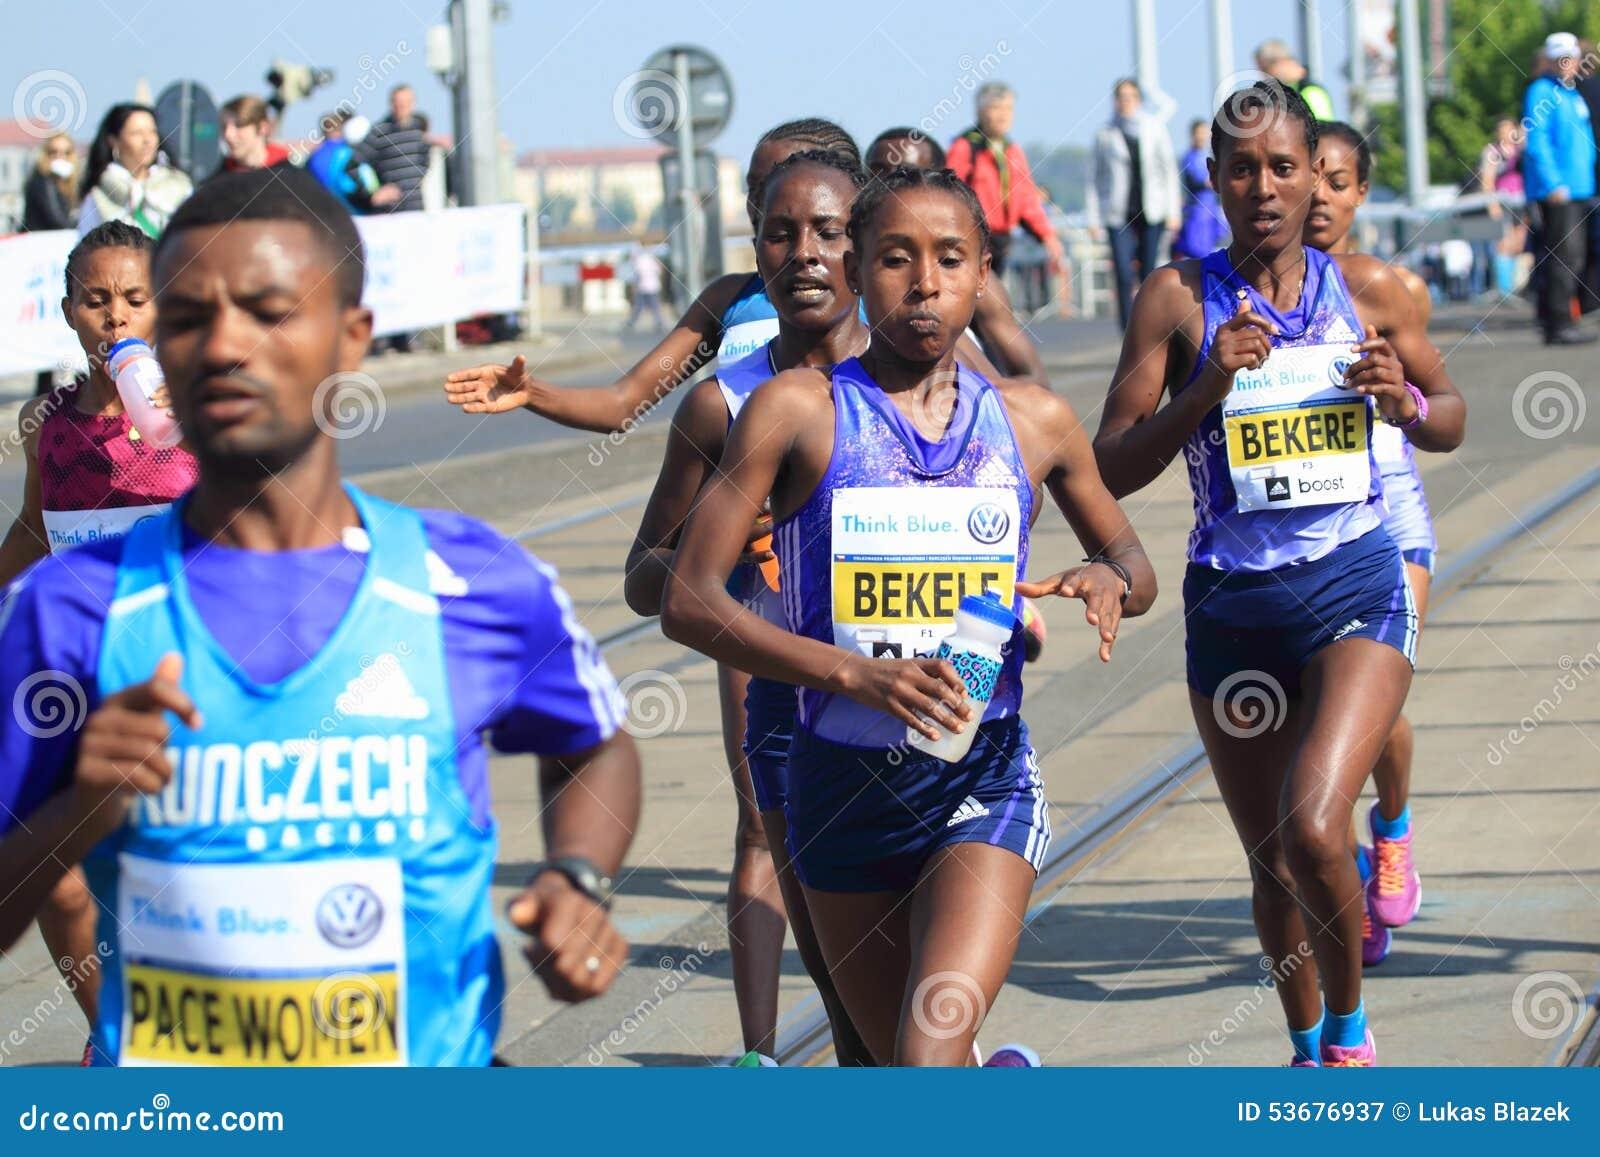 https://thumbs.dreamstime.com/z/tadelech-bekele-prague-marathon-ethiopia-volkswagen-held-53676937.jpg